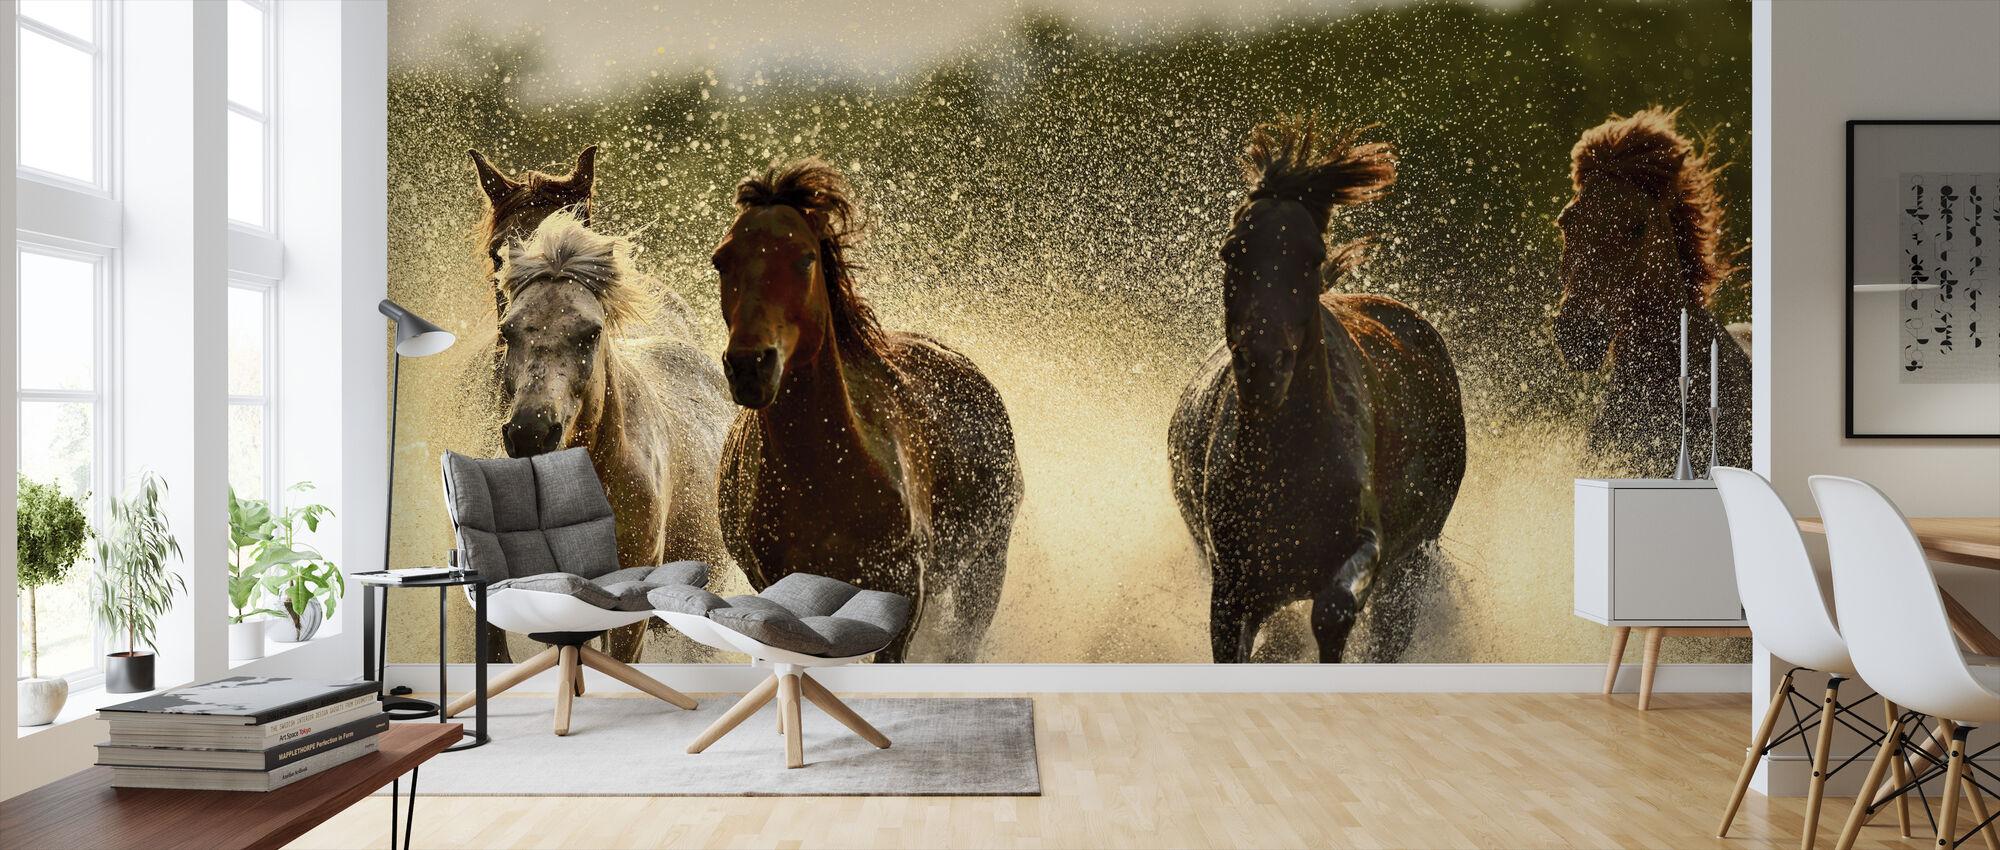 Horses in River - Wallpaper - Living Room